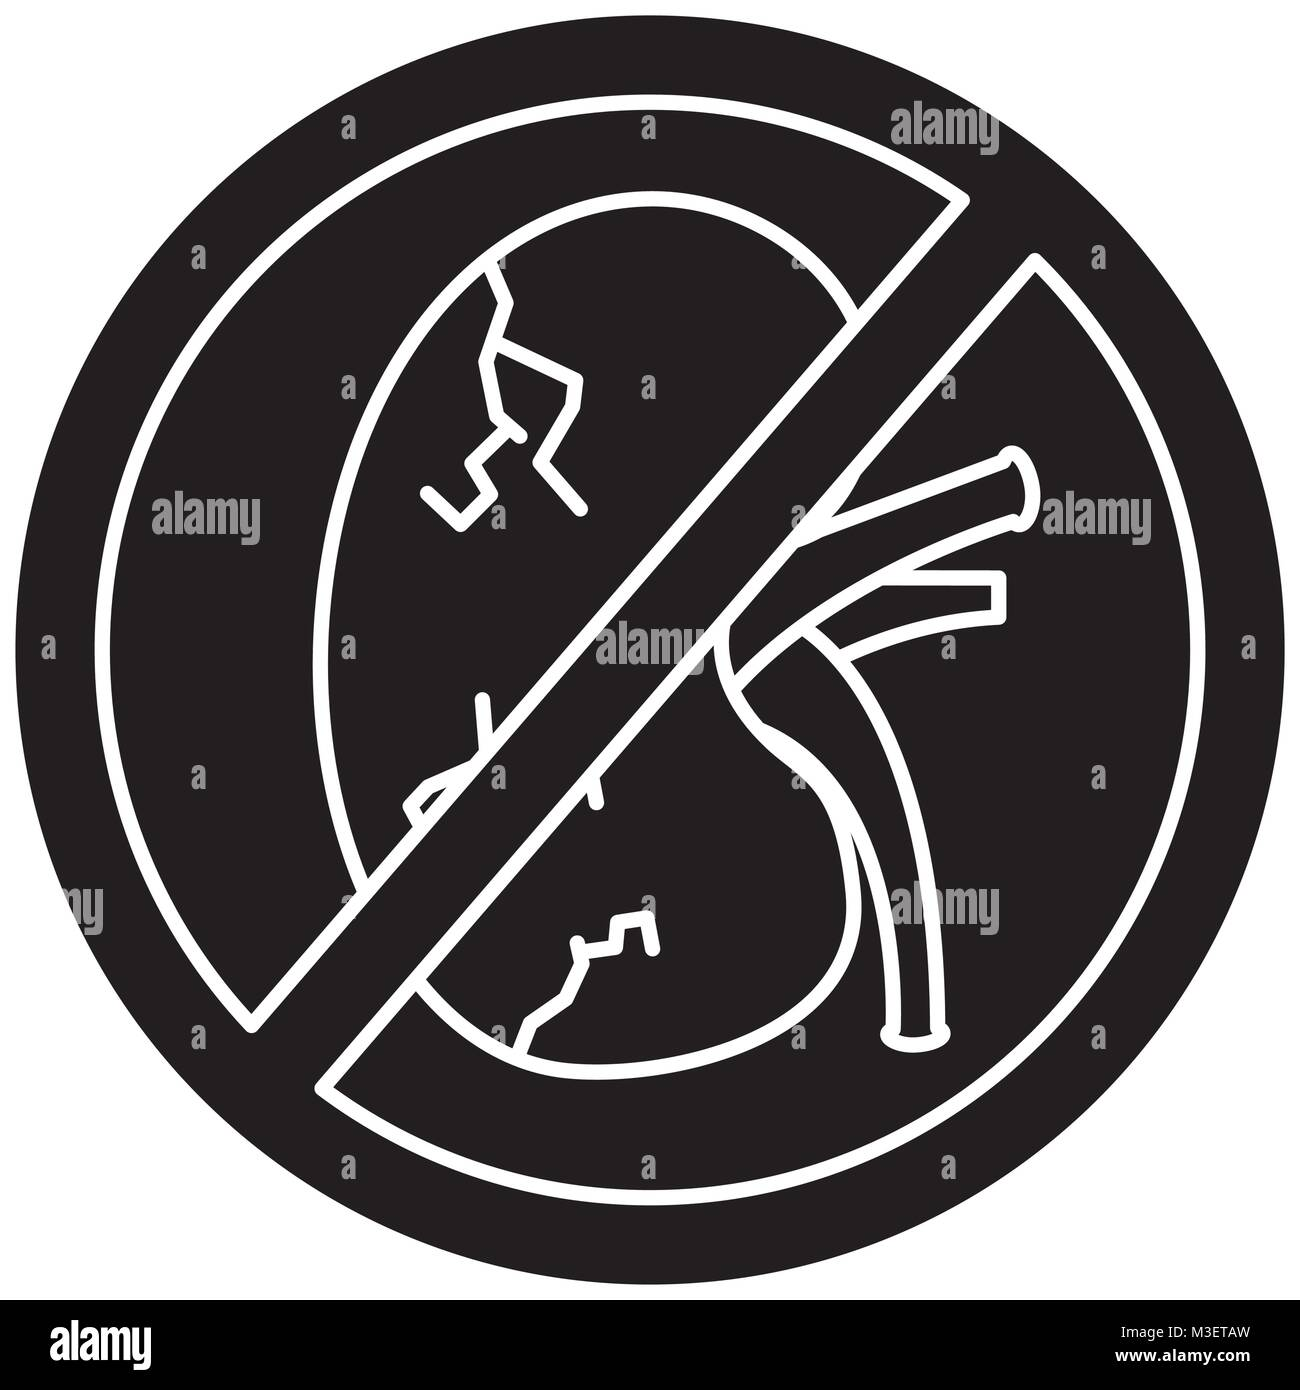 No human kidney disease medical diagram forbidden sign stock vector no human kidney disease medical diagram forbidden sign ccuart Gallery